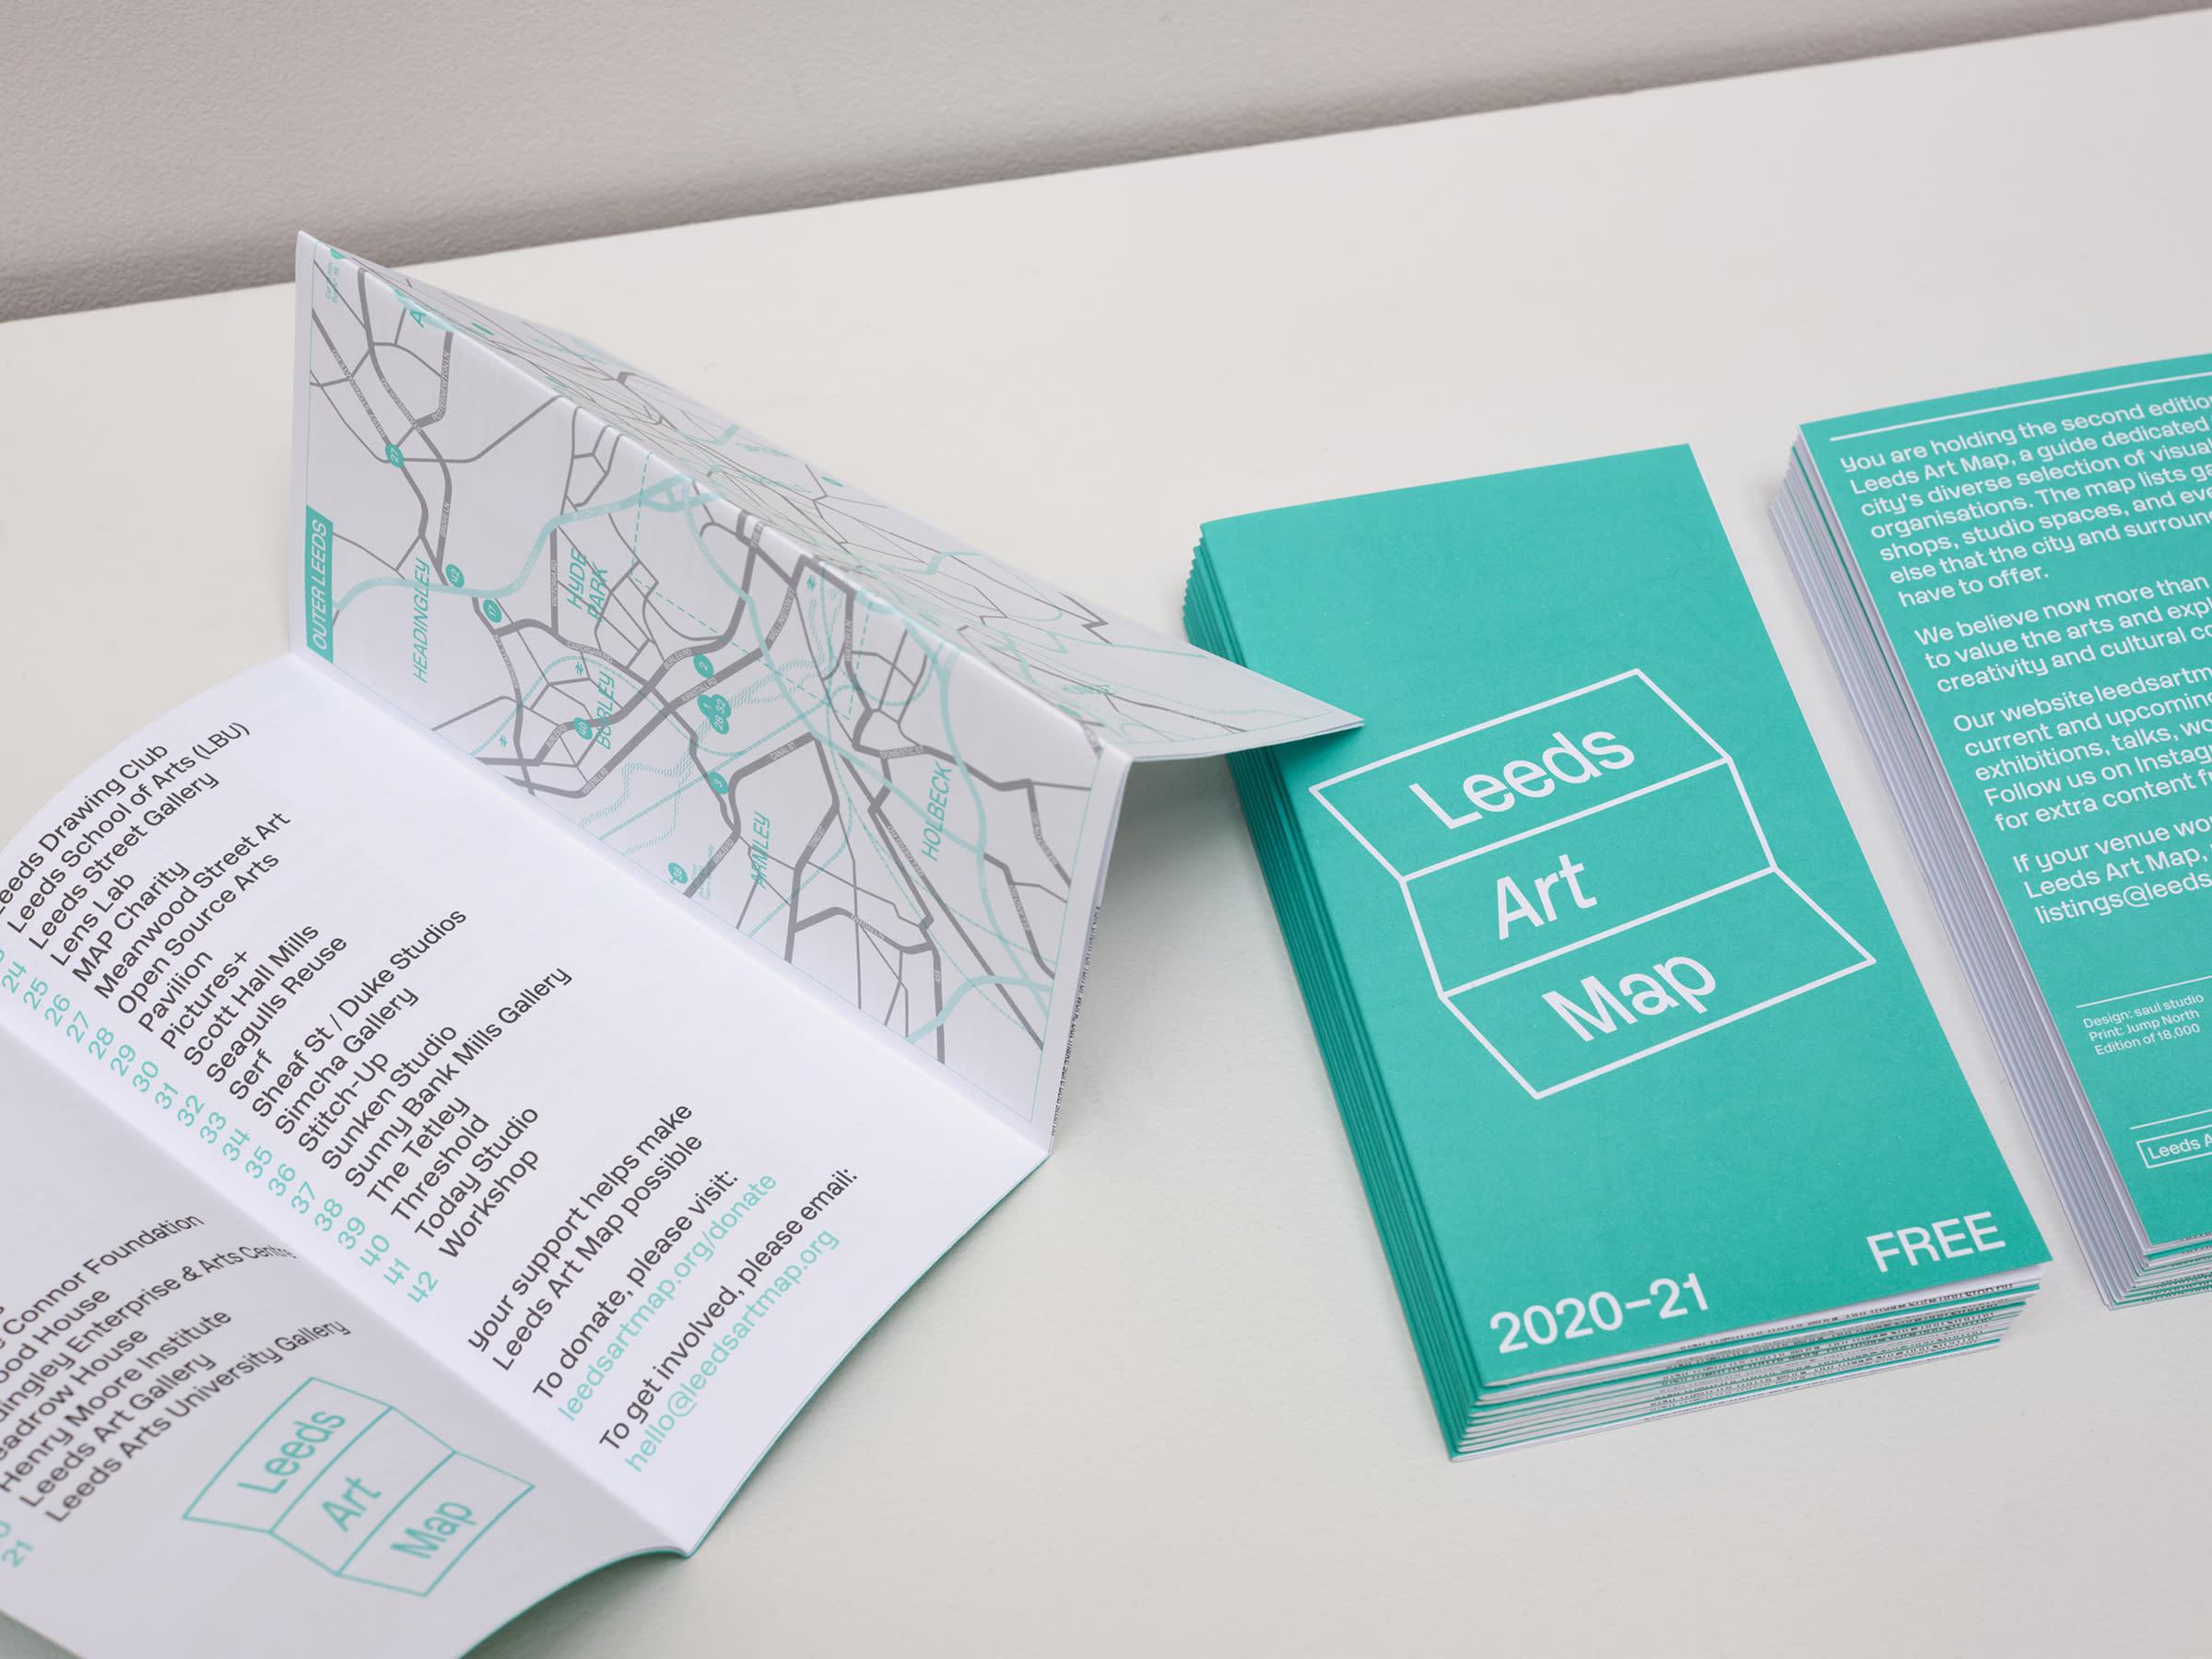 saul studio — Leeds Art Map